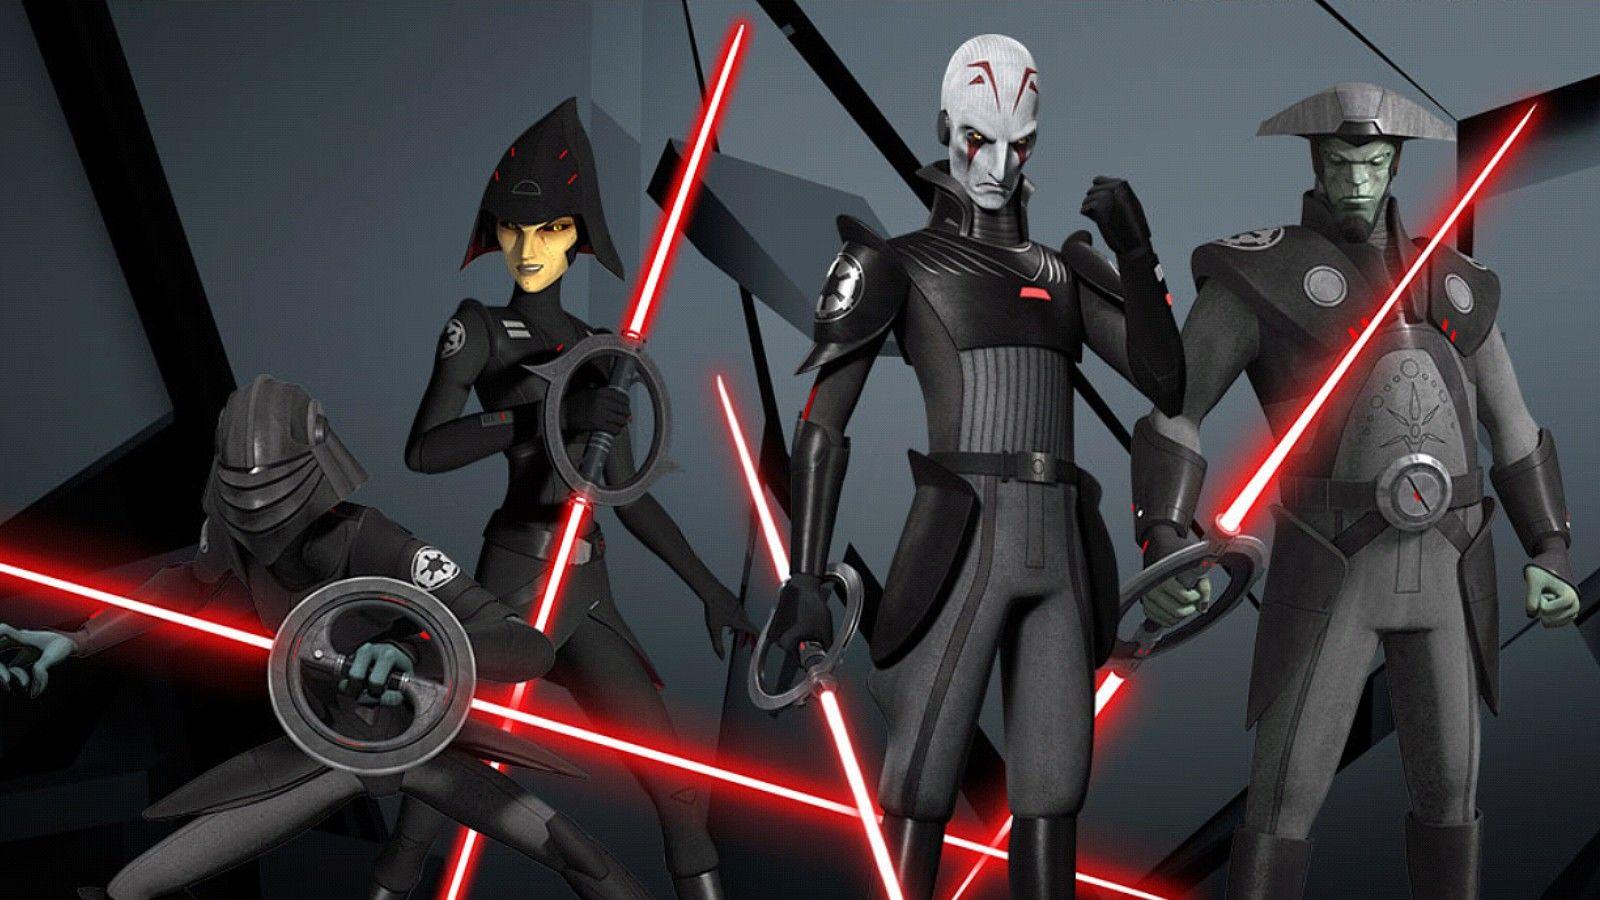 Les Inquisiteurs de Star Wars Rebels